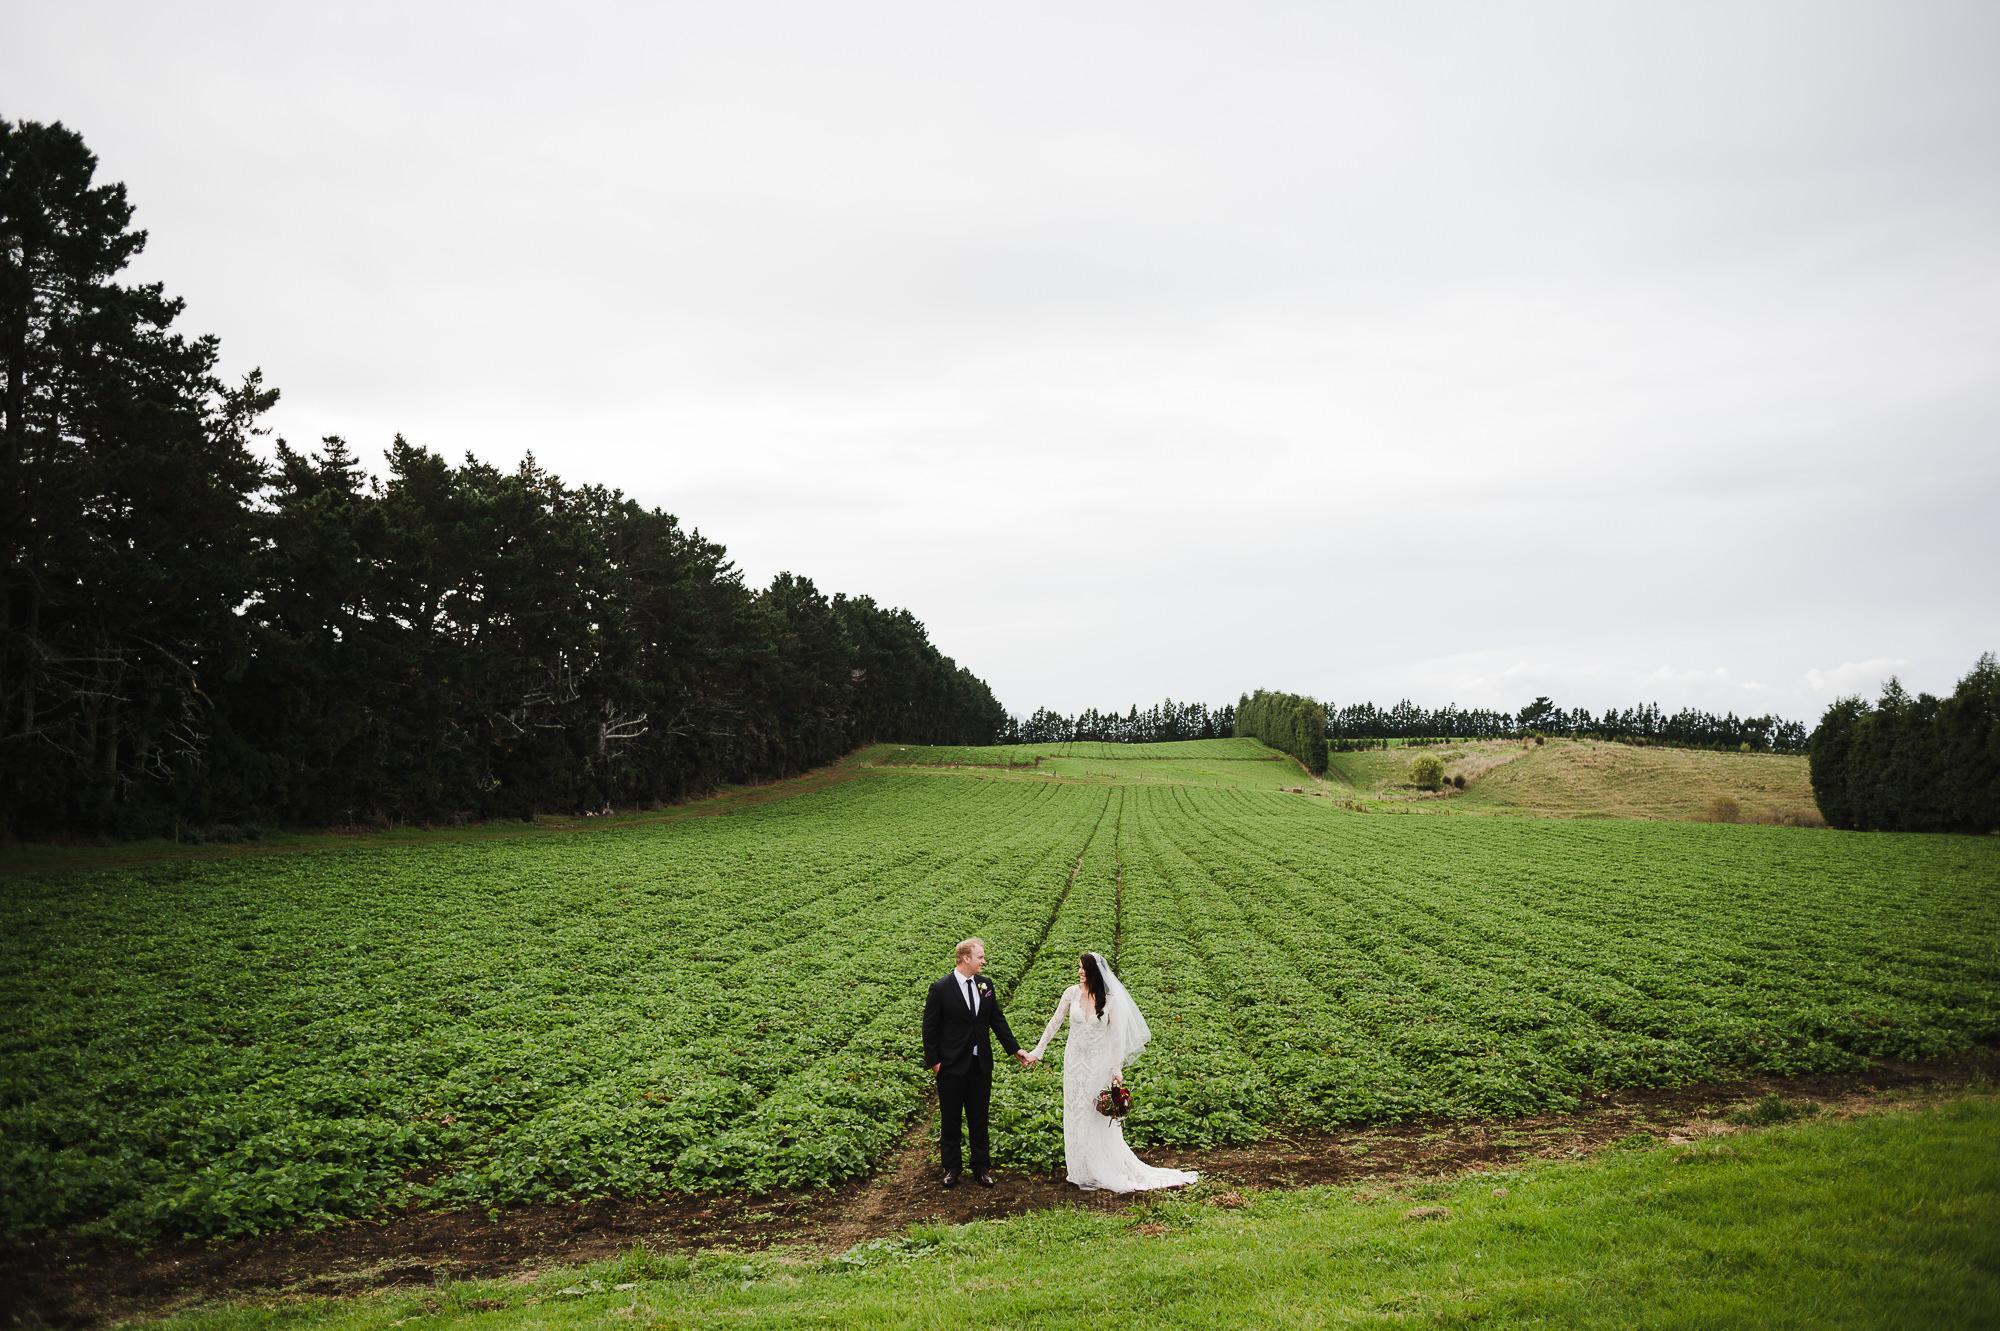 landscape style wedding portrait.jpg